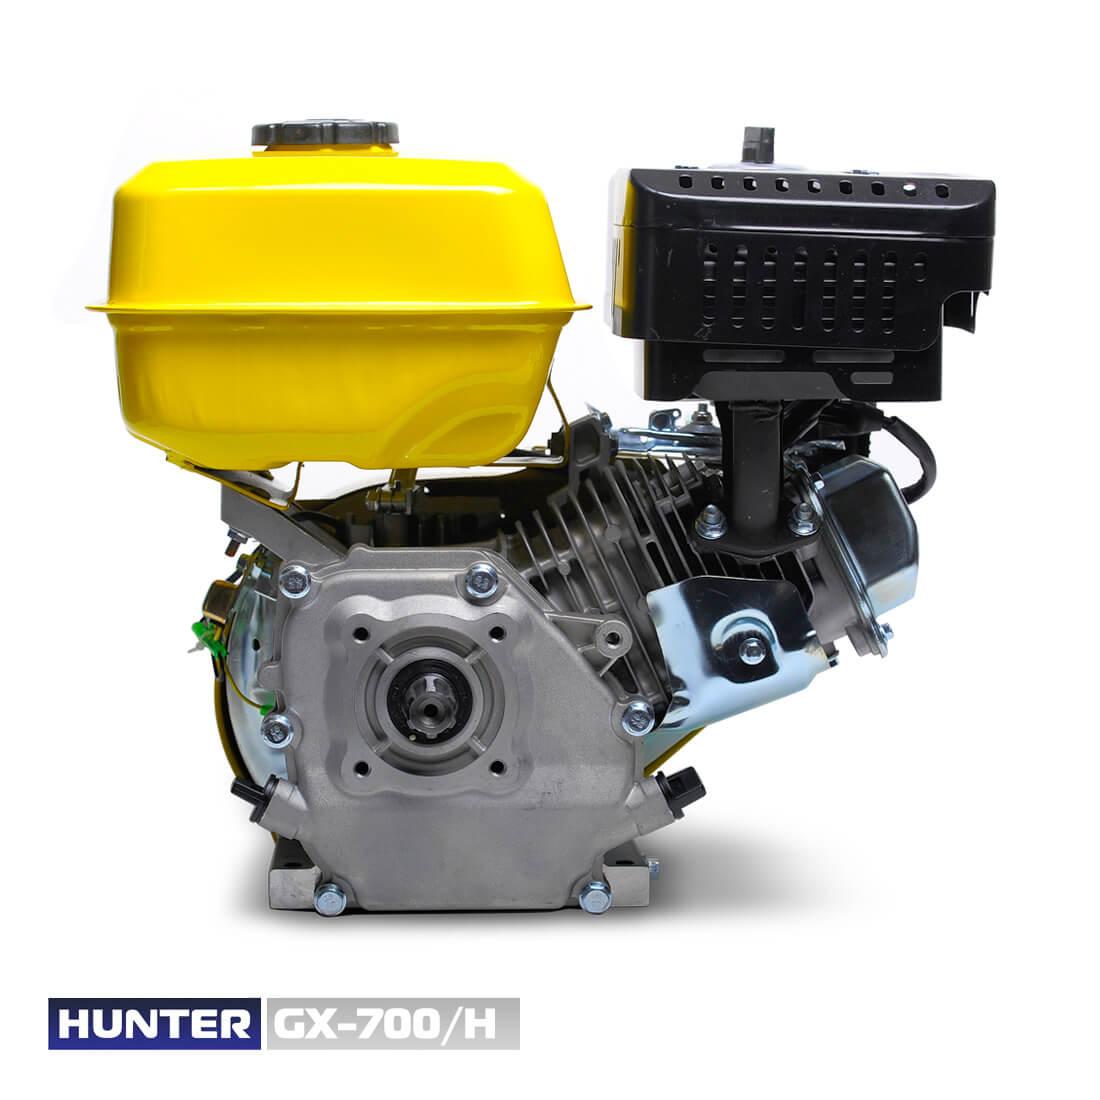 Фото GX-700/H (шлиц) цена 3500грн №5 — Hunter